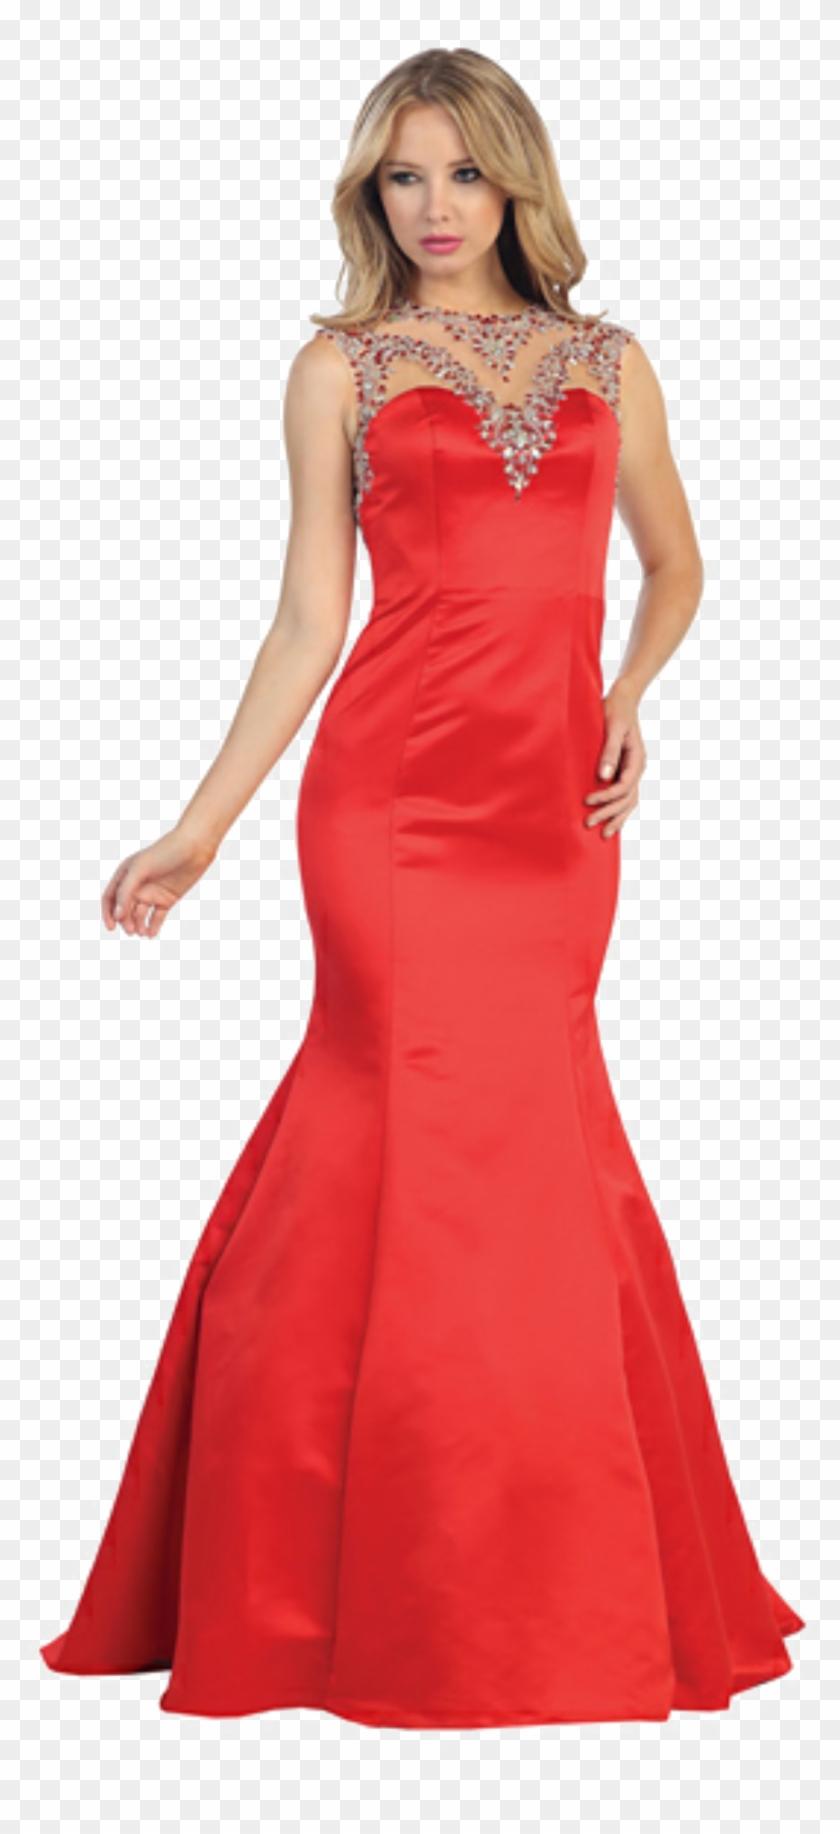 dbe9bbeeff2 Cocktail Dresses For Prom Transparent Image - Vestido Para Fiesta De Gala